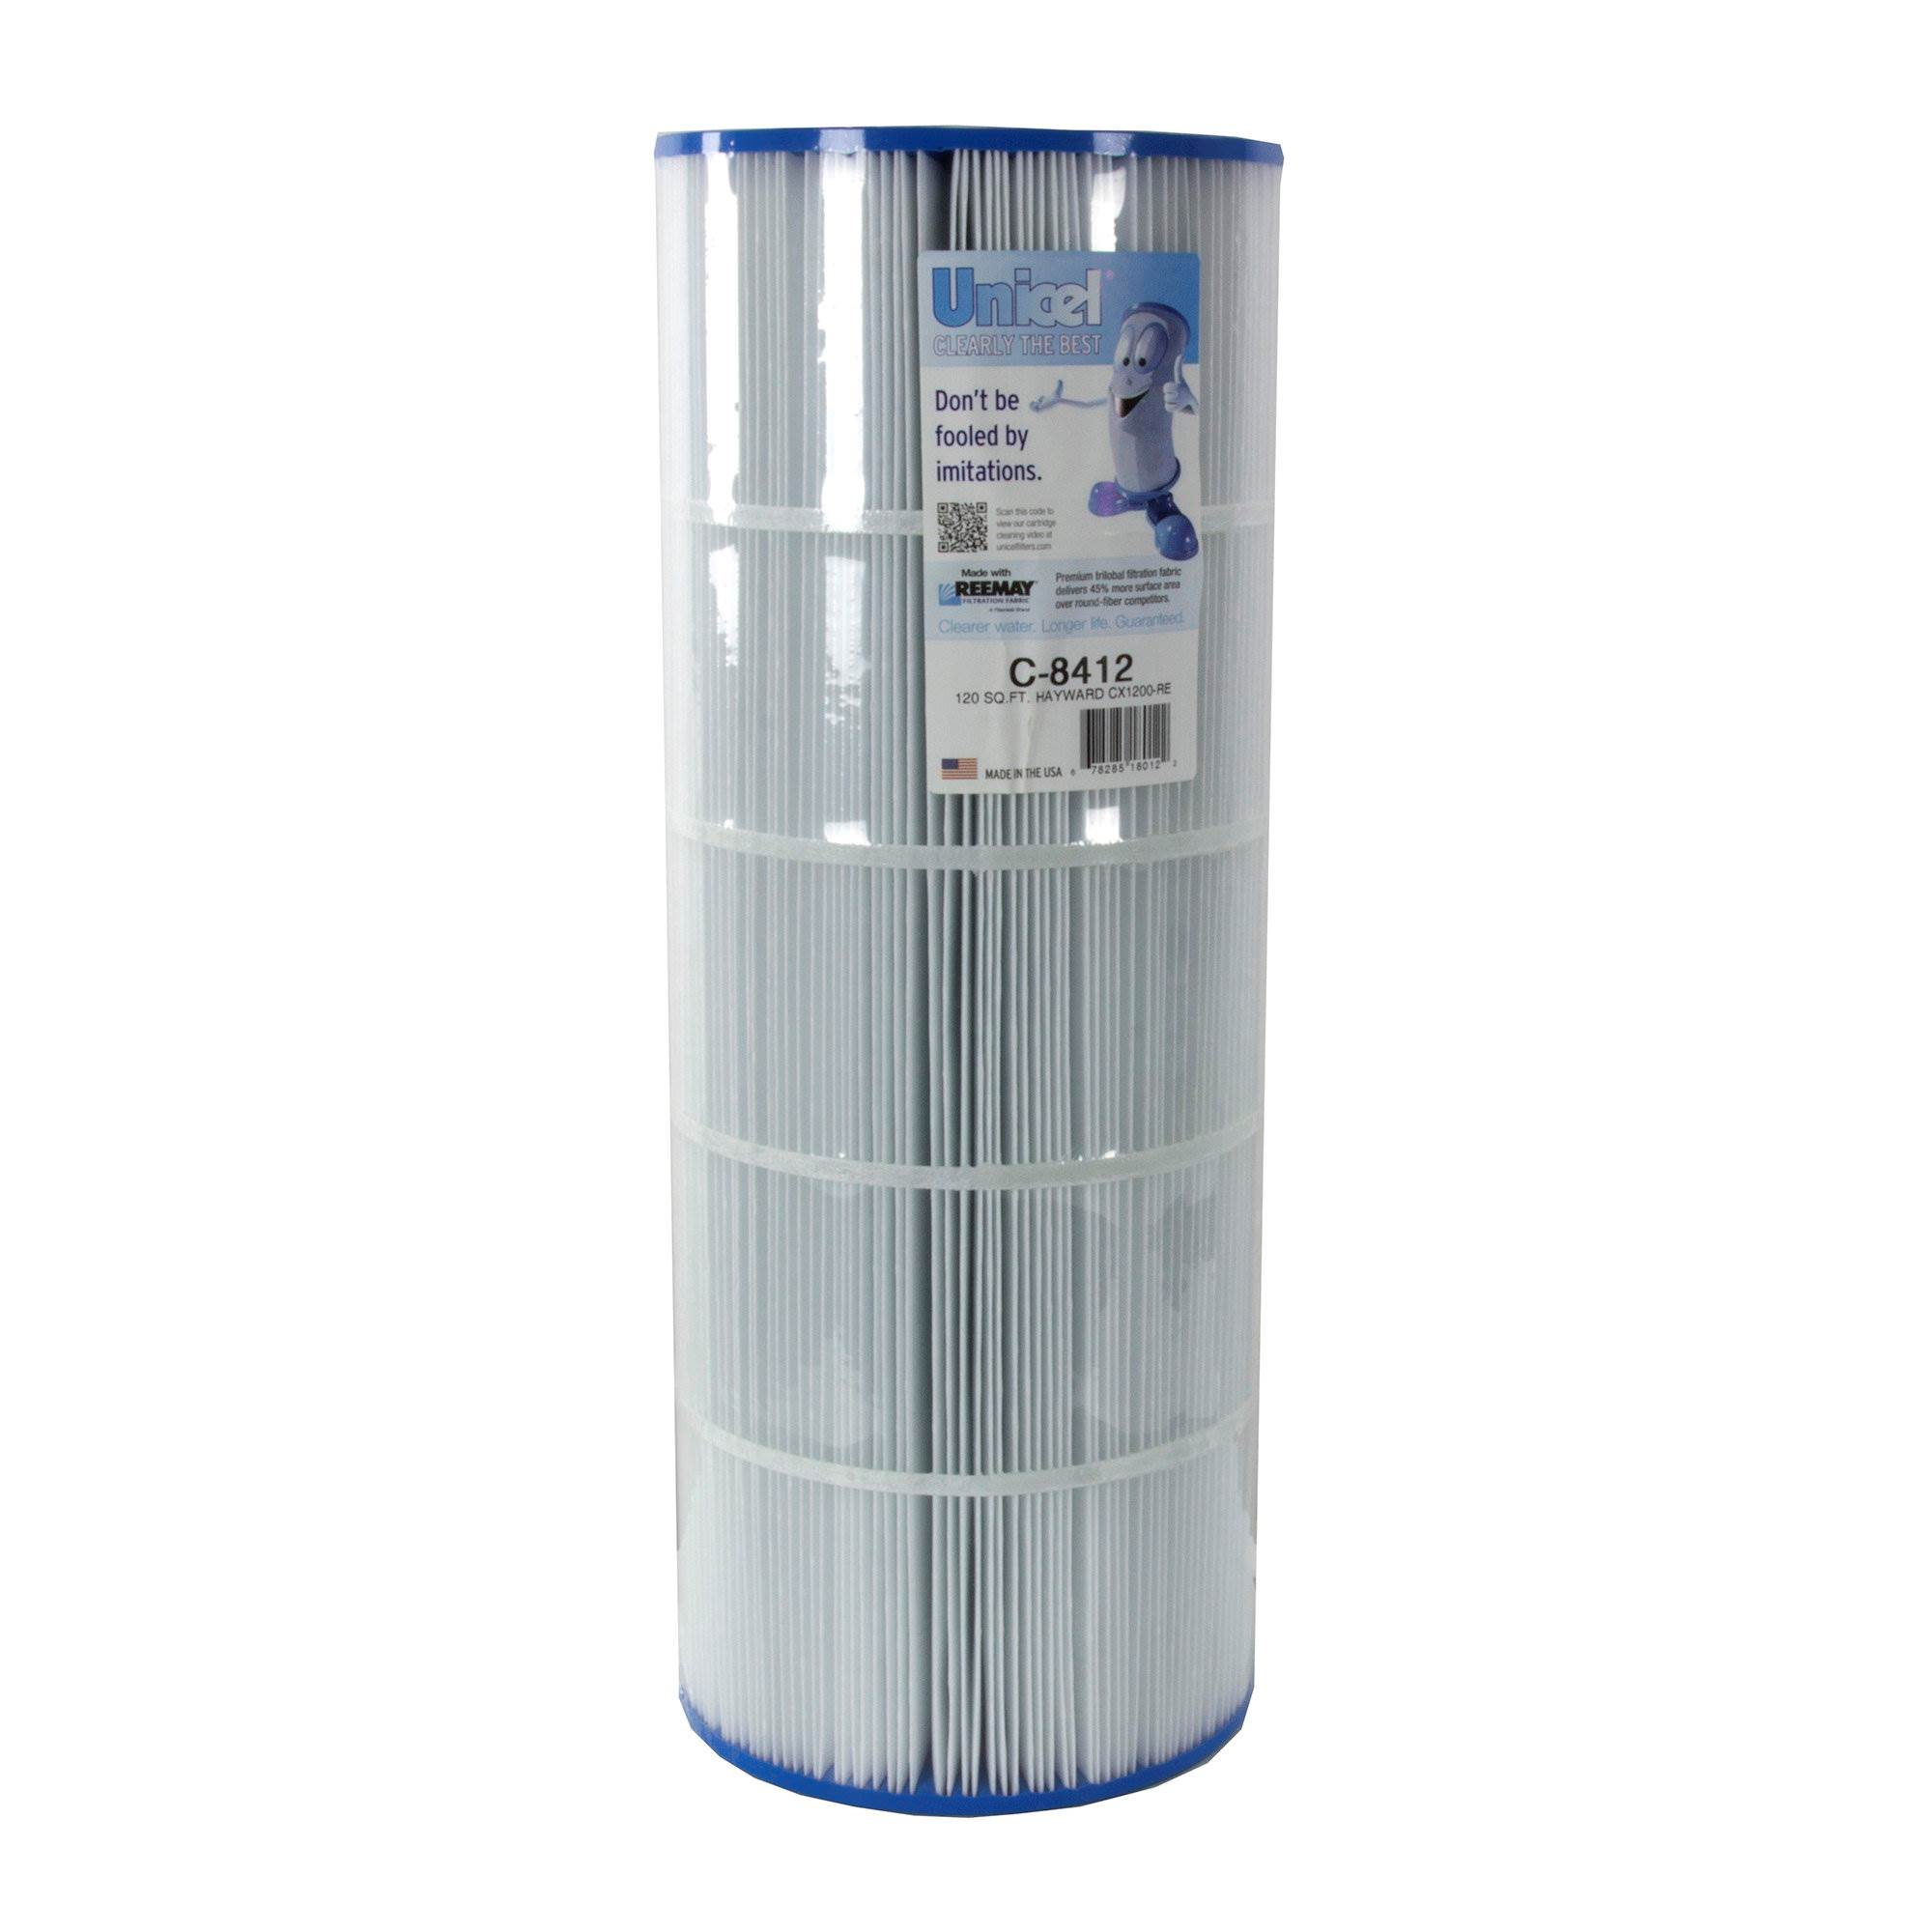 Poolmaster 12277 Replacement Filter Cartridge for Intex Easy Set Pool B 59901W Filter